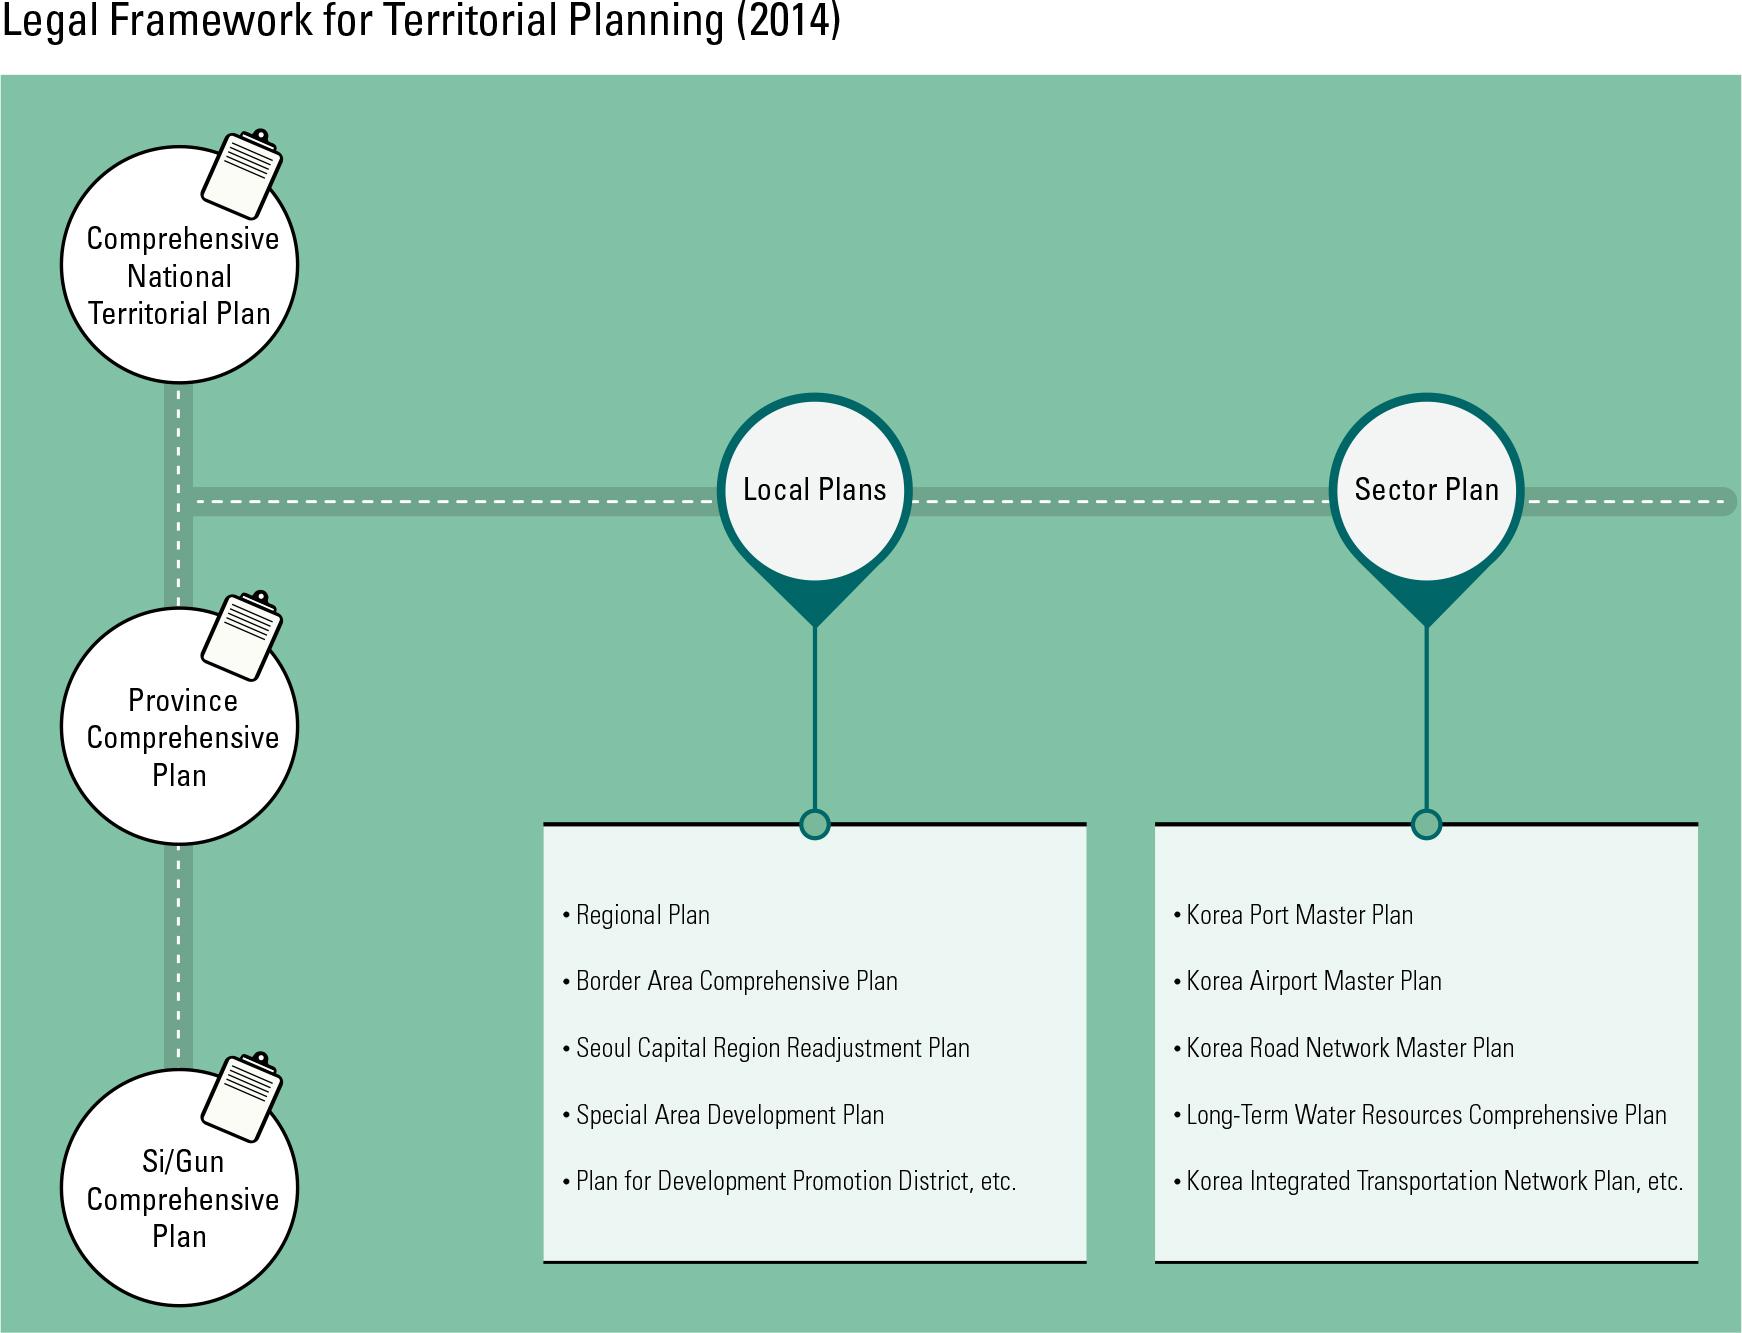 Legal Framework for Territorial Planning (2014)